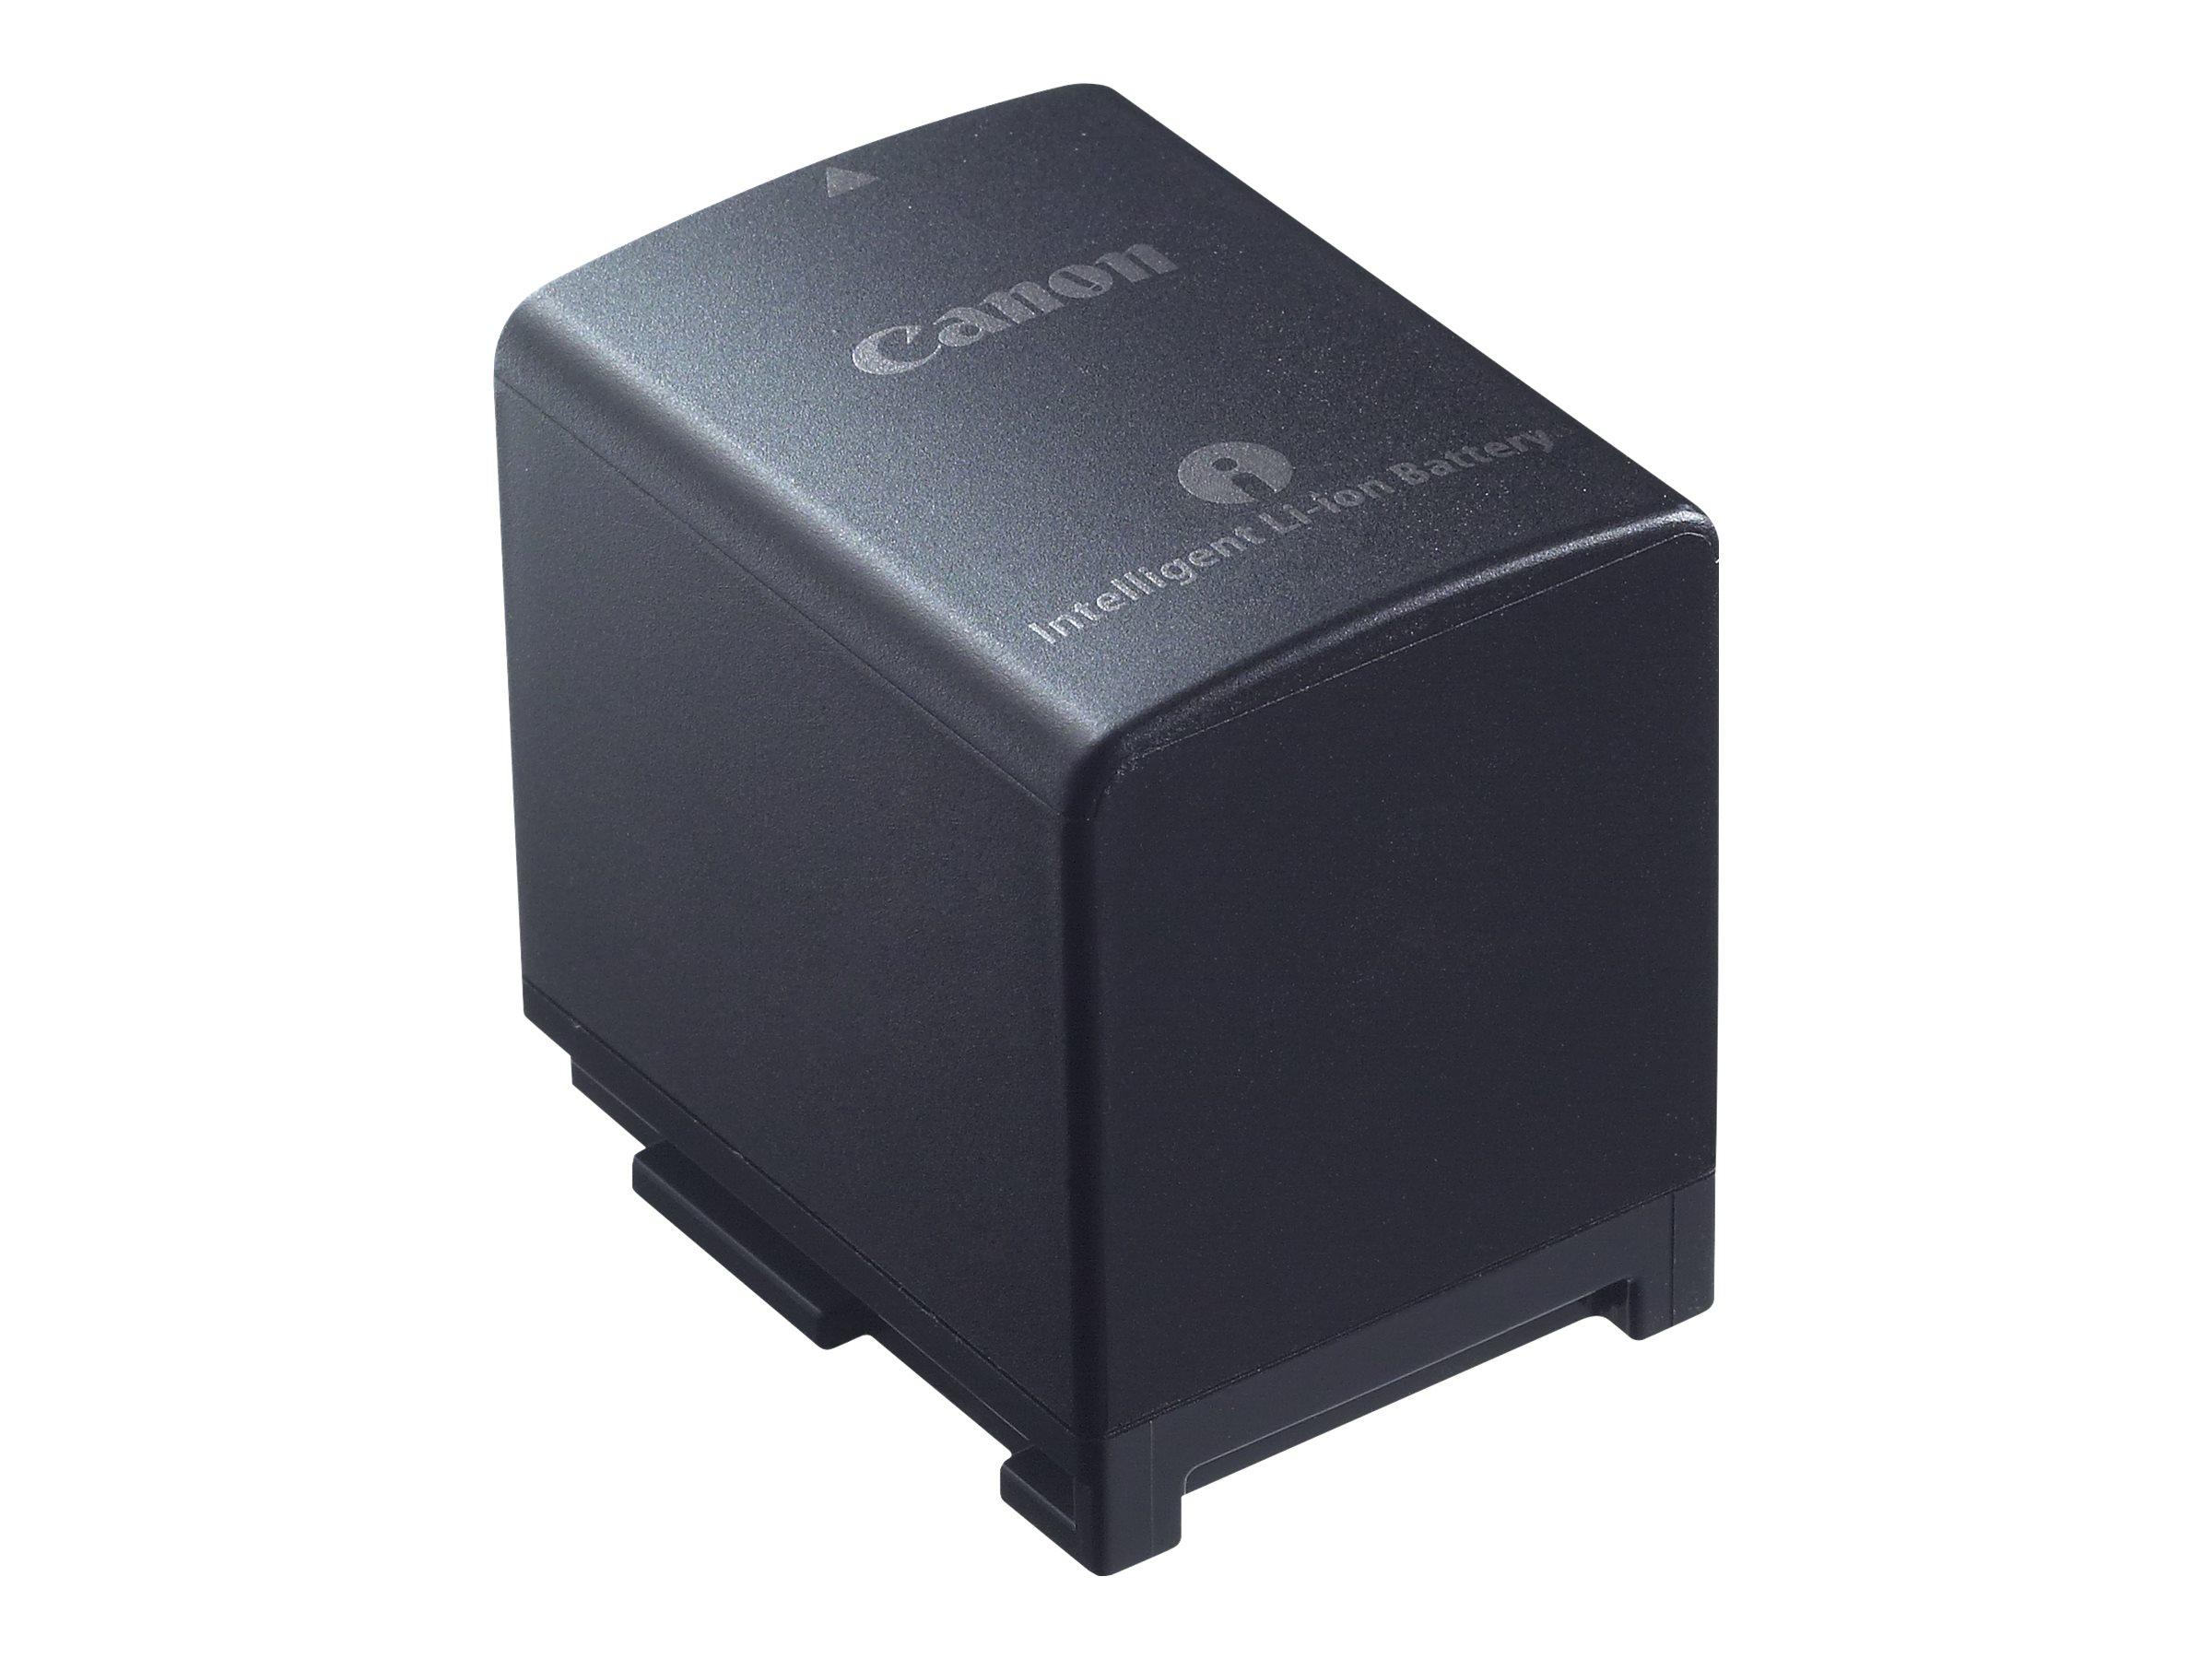 Canon BP-820 - Batterie - Li-Ion - 1780 mAh - für Canon XA15, XA40, XA45, XA50, XA55; LEGRIA HF G26, HF G50, HF G60; VIXIA HF G5